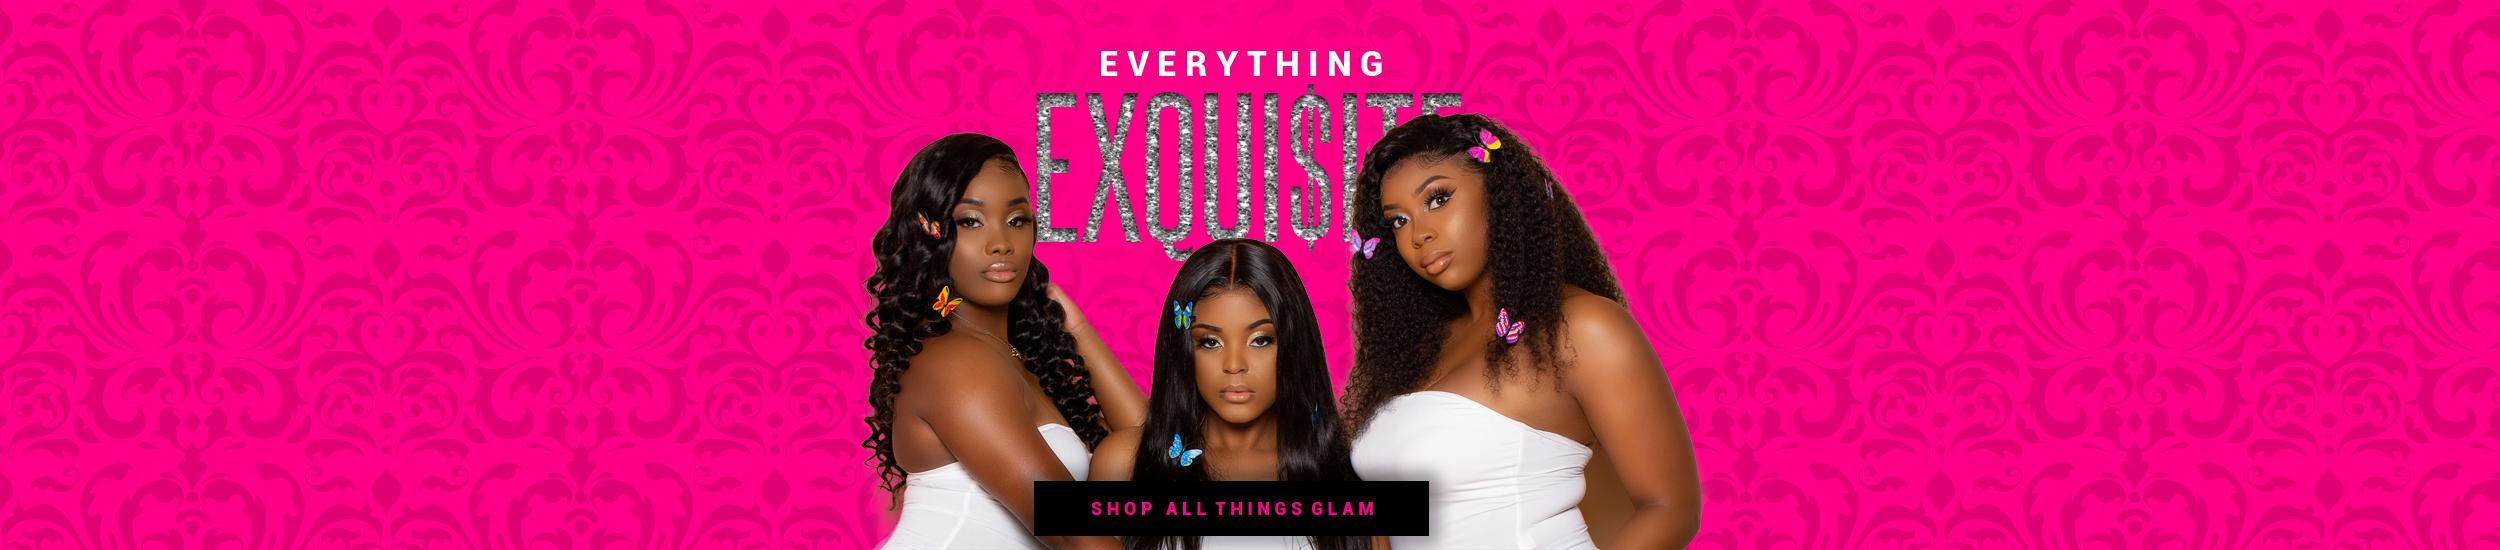 exquisiteglam-banner1.png